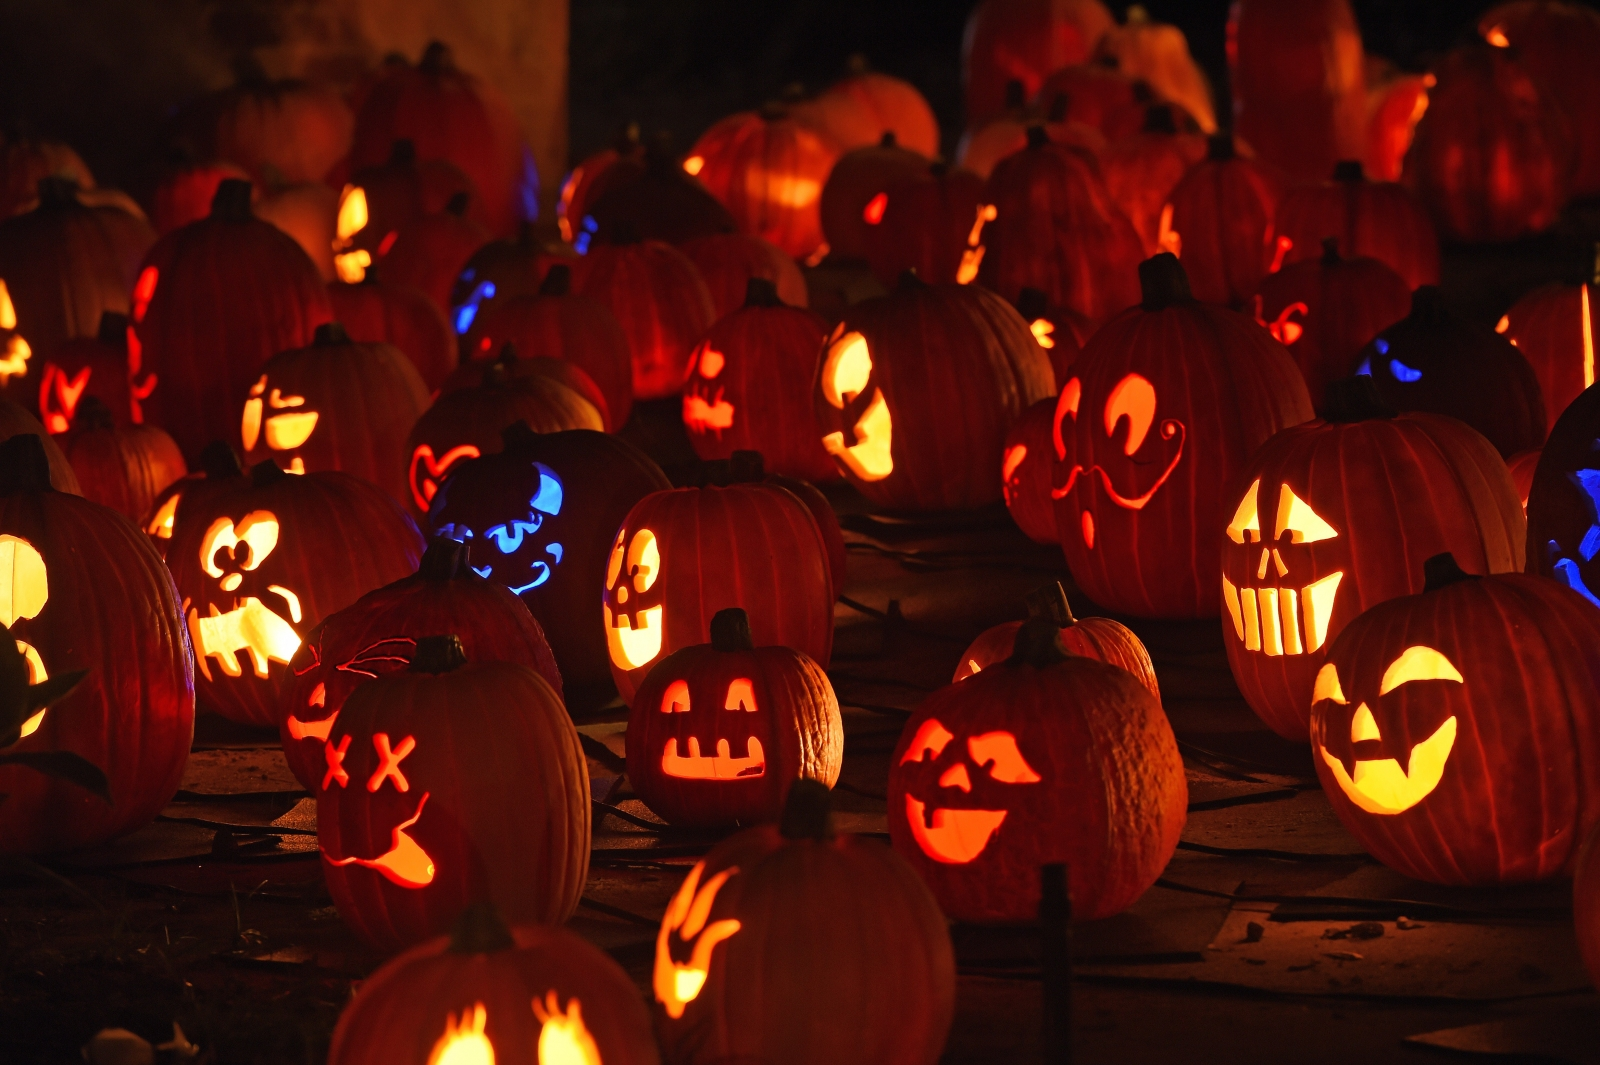 Jack-o'-Lanterns on show at an exhibition in La Canada Flintridge, California